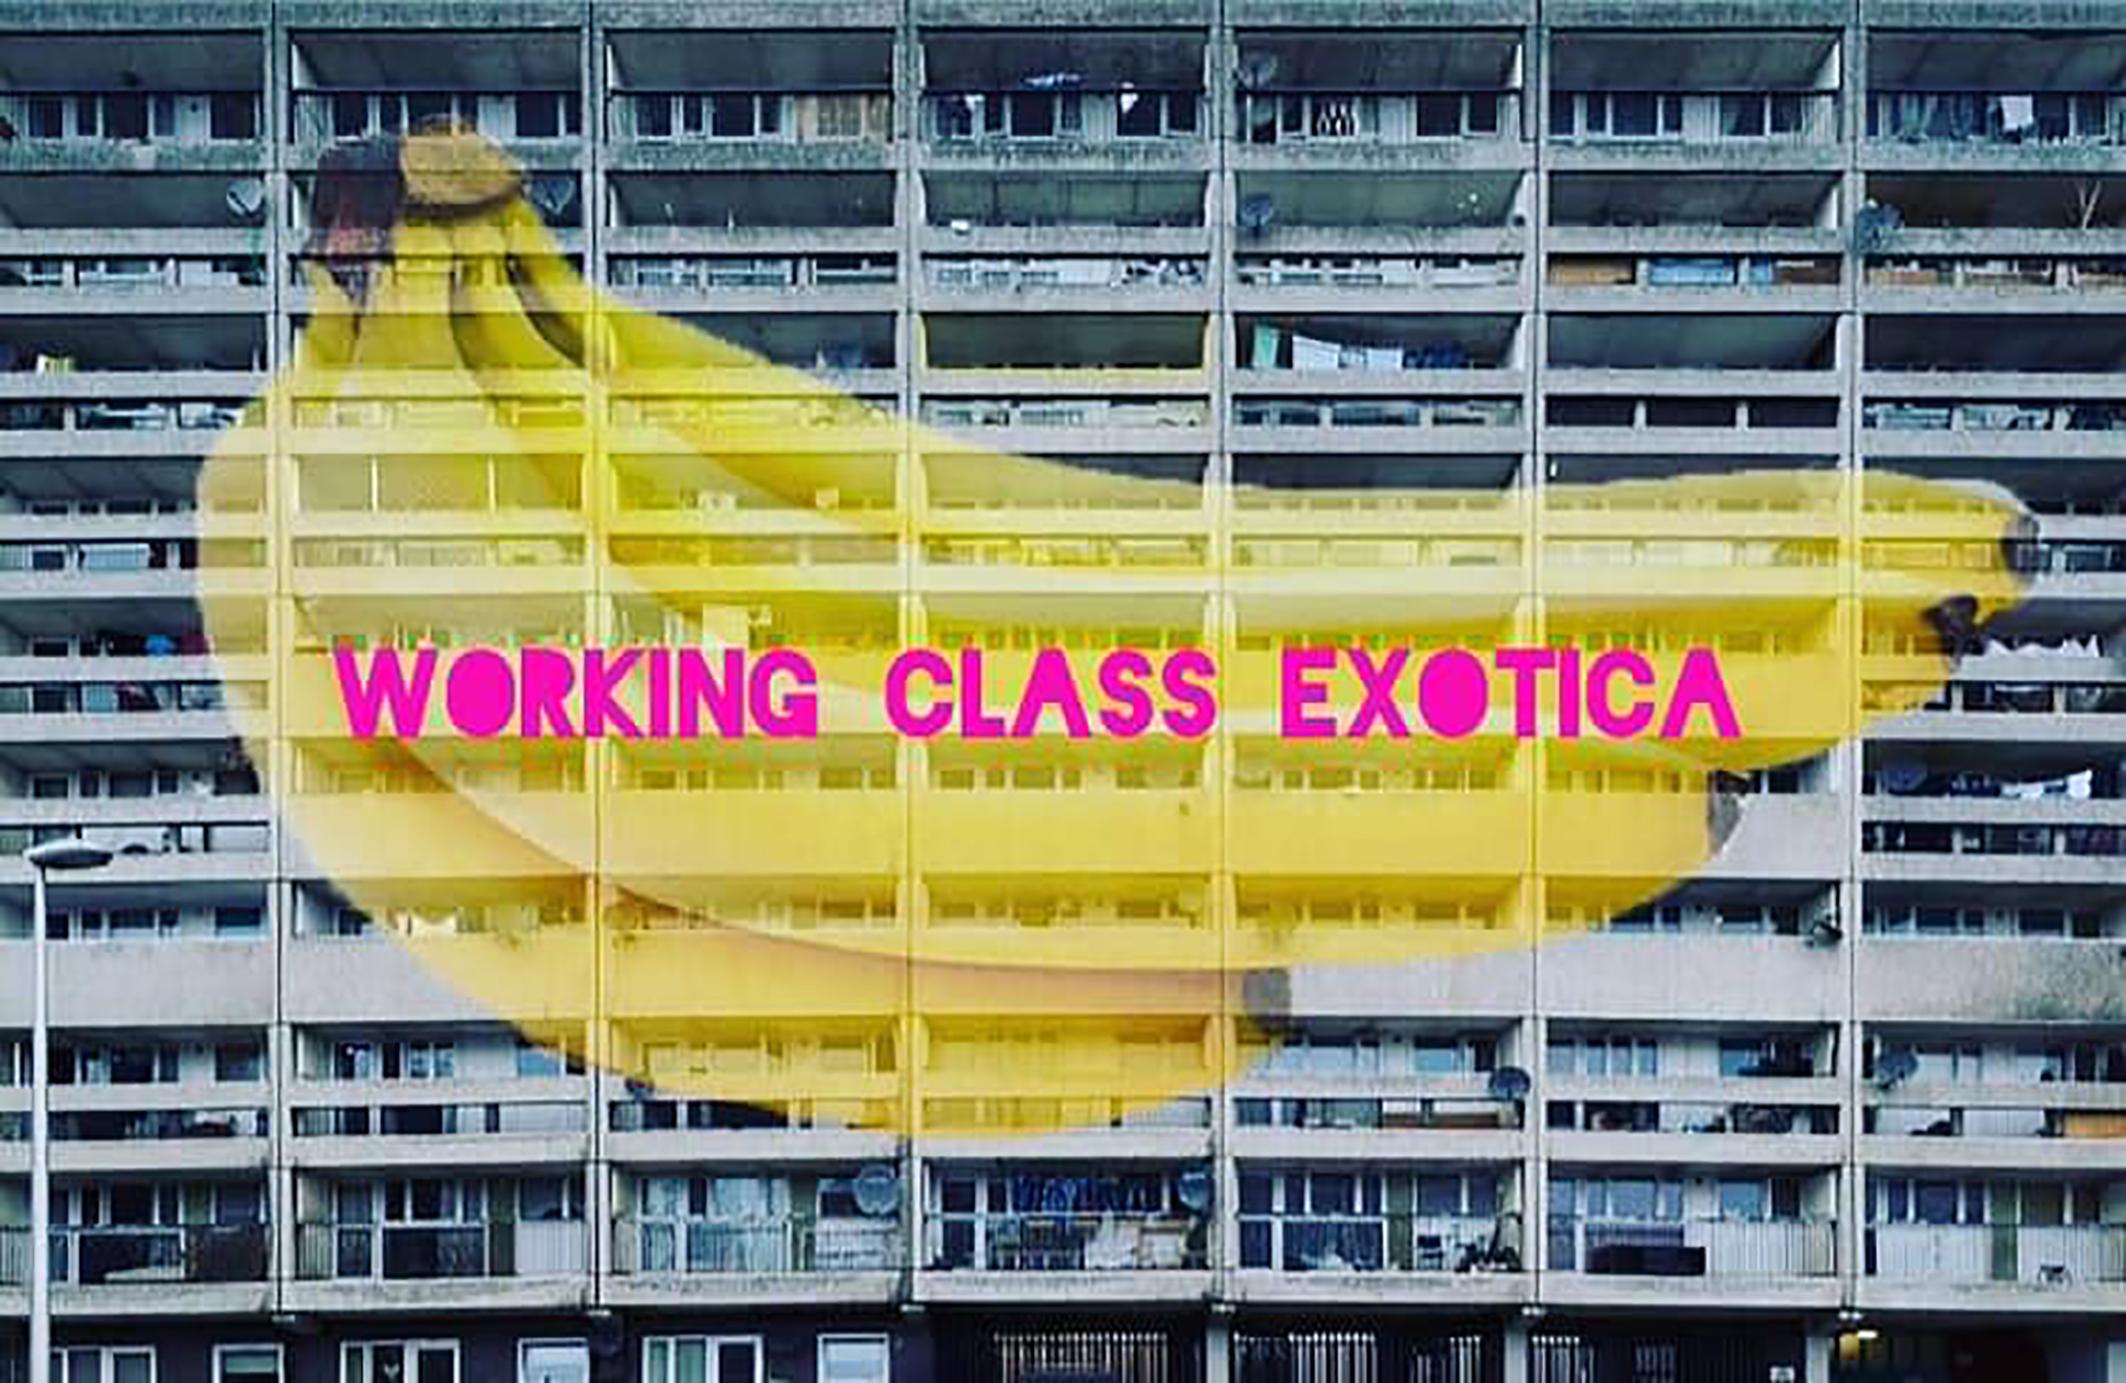 WorkingClassExotica_01_Credit Heather Marshall Creative Electric.jpg